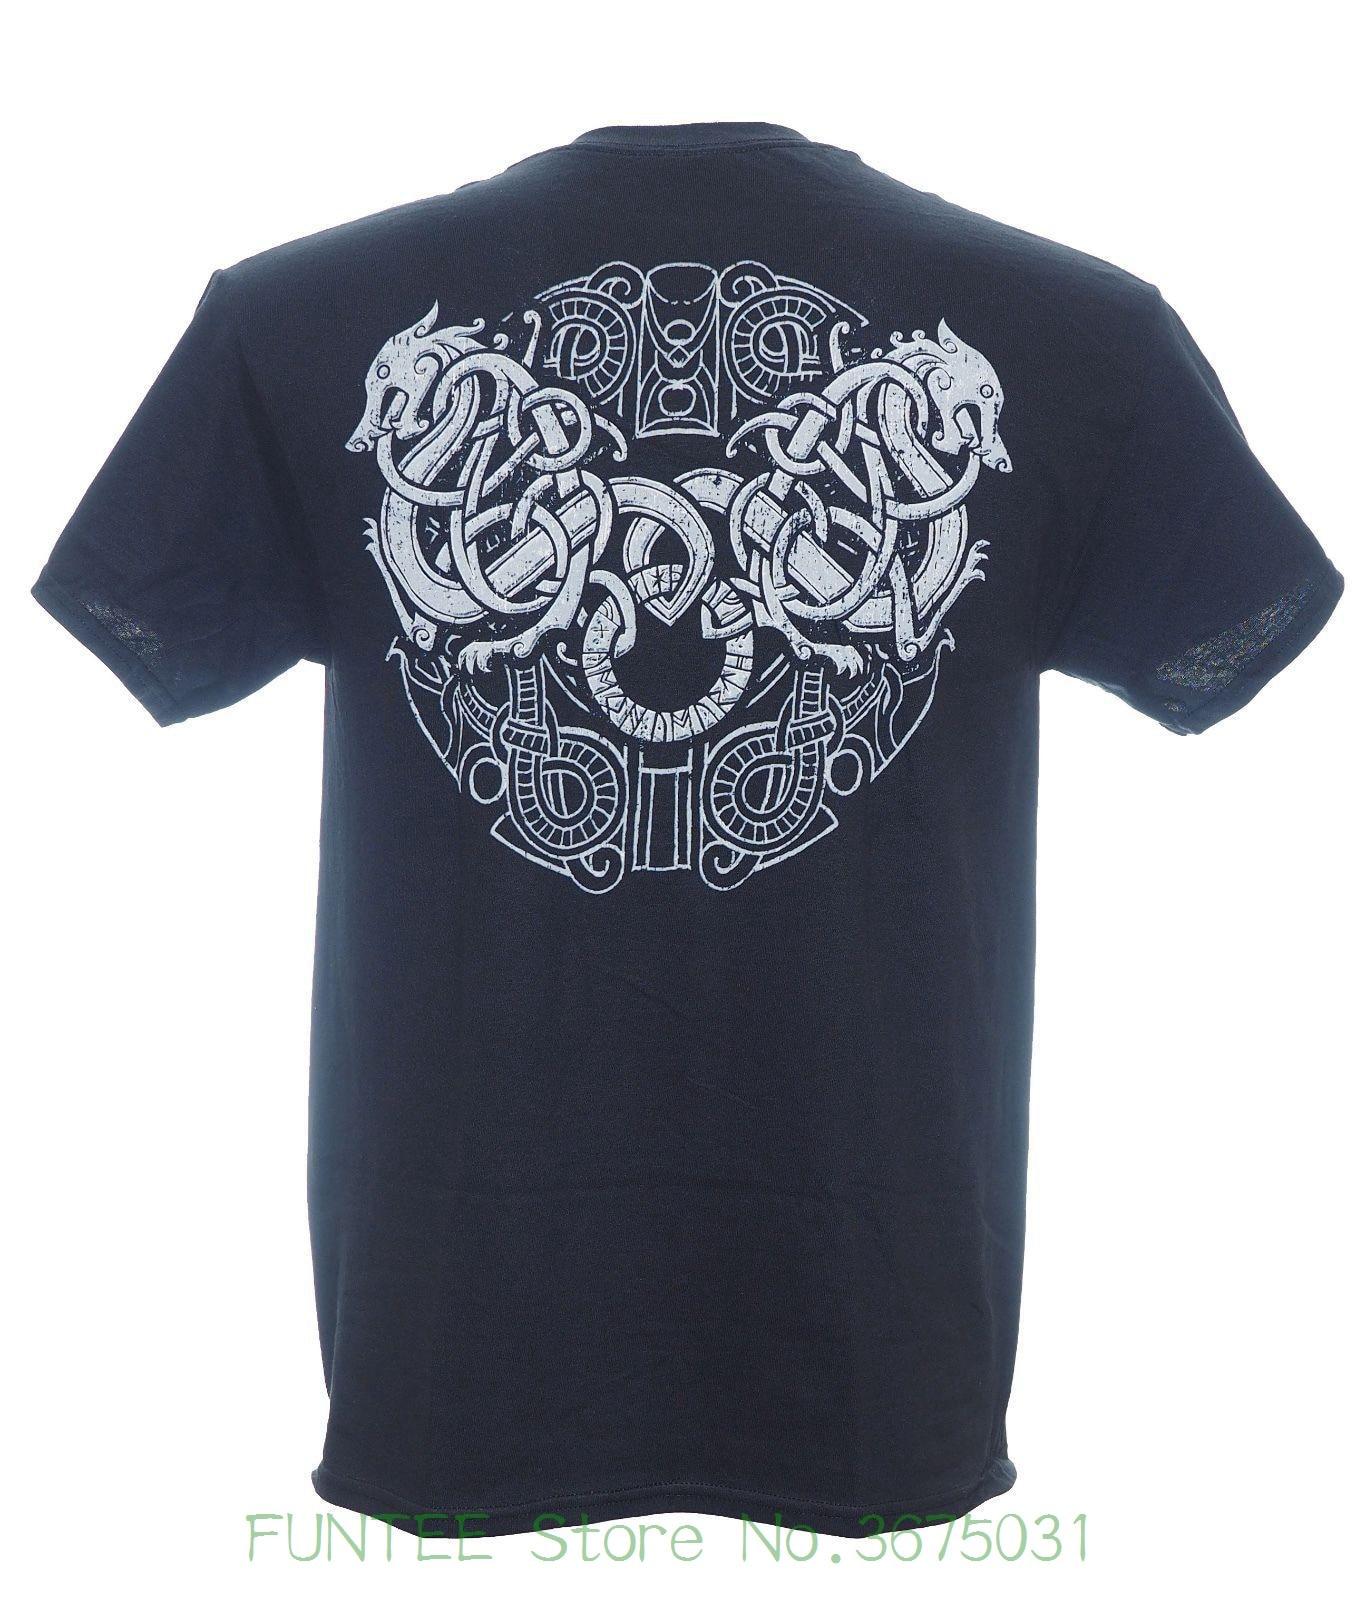 Short Sleeve Mens Formal Shirts Amon Amarth - Grey Skull And Shield T-shirt - Size Medium M - Viking Death Metal